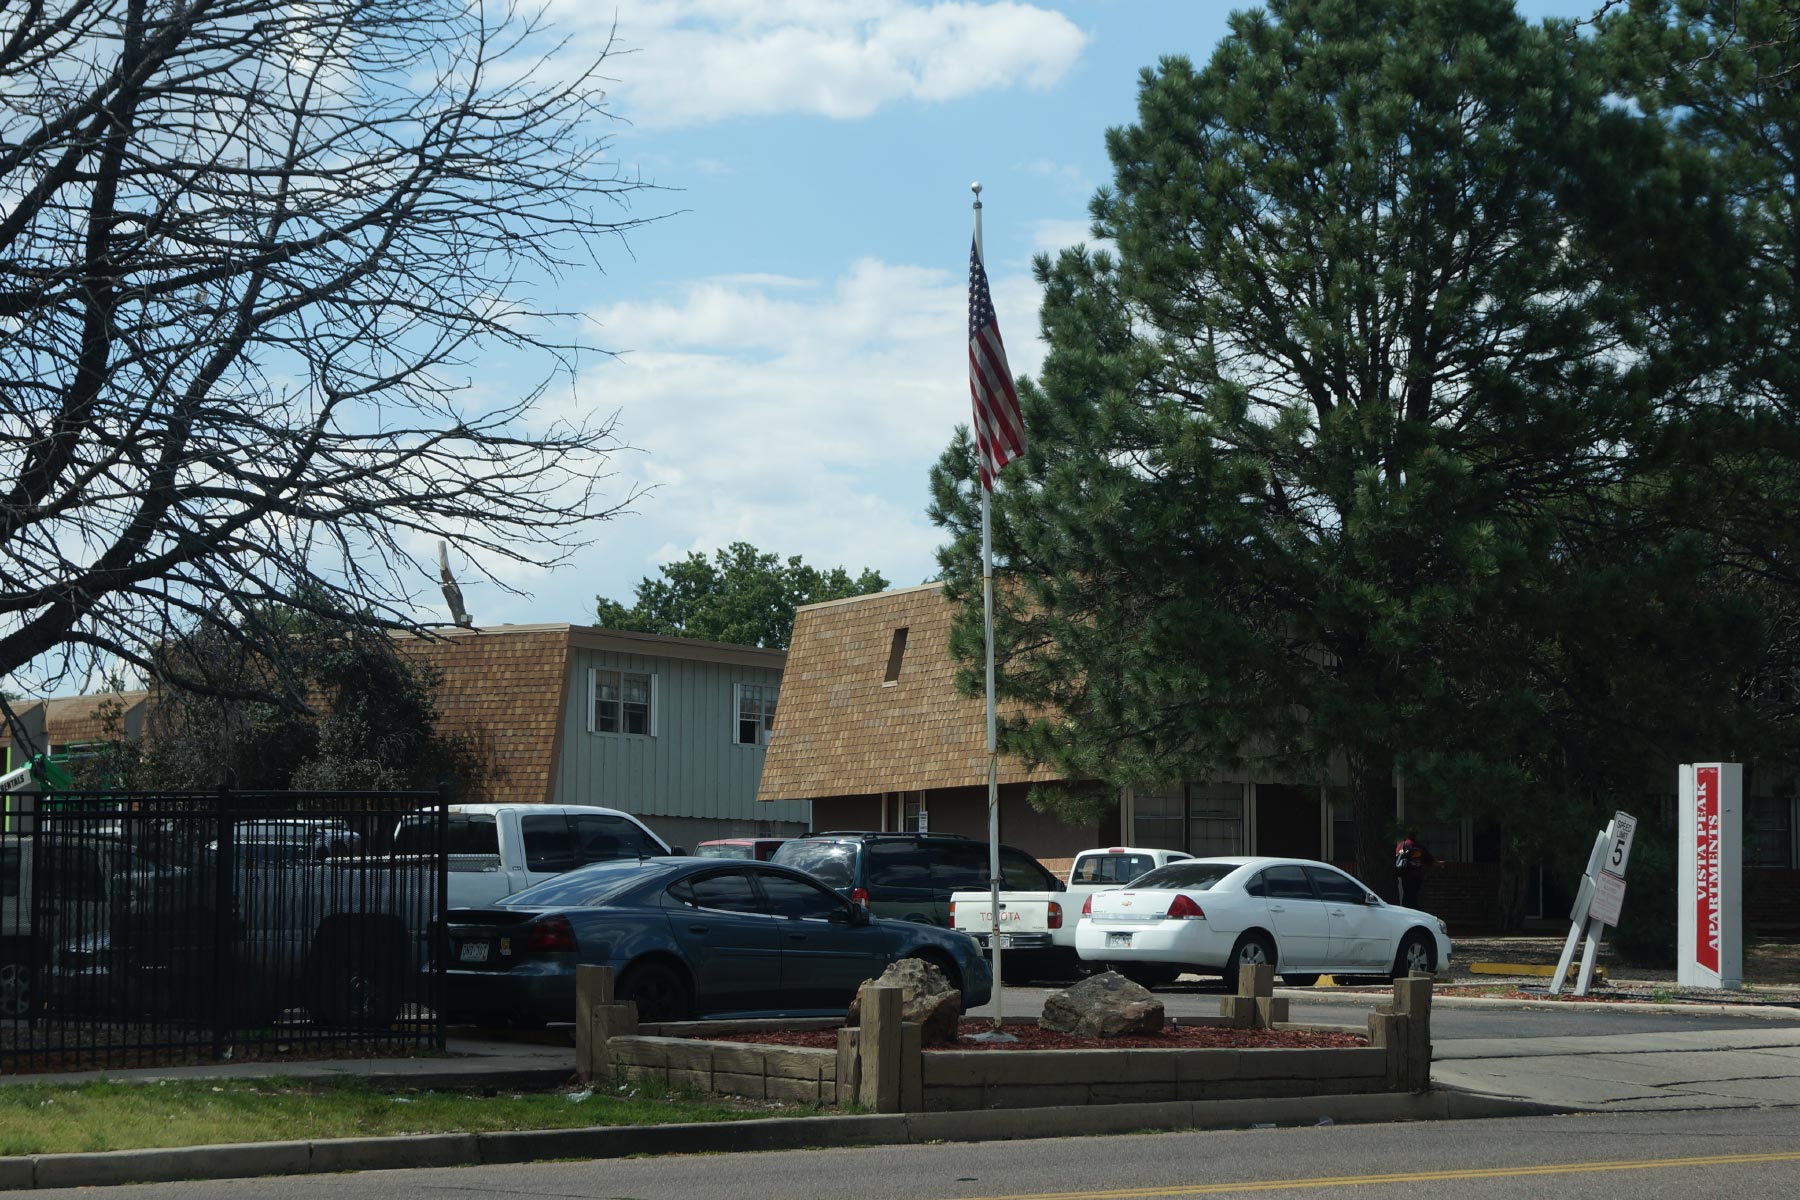 Potter Drive 120 Unit Apartment Complex